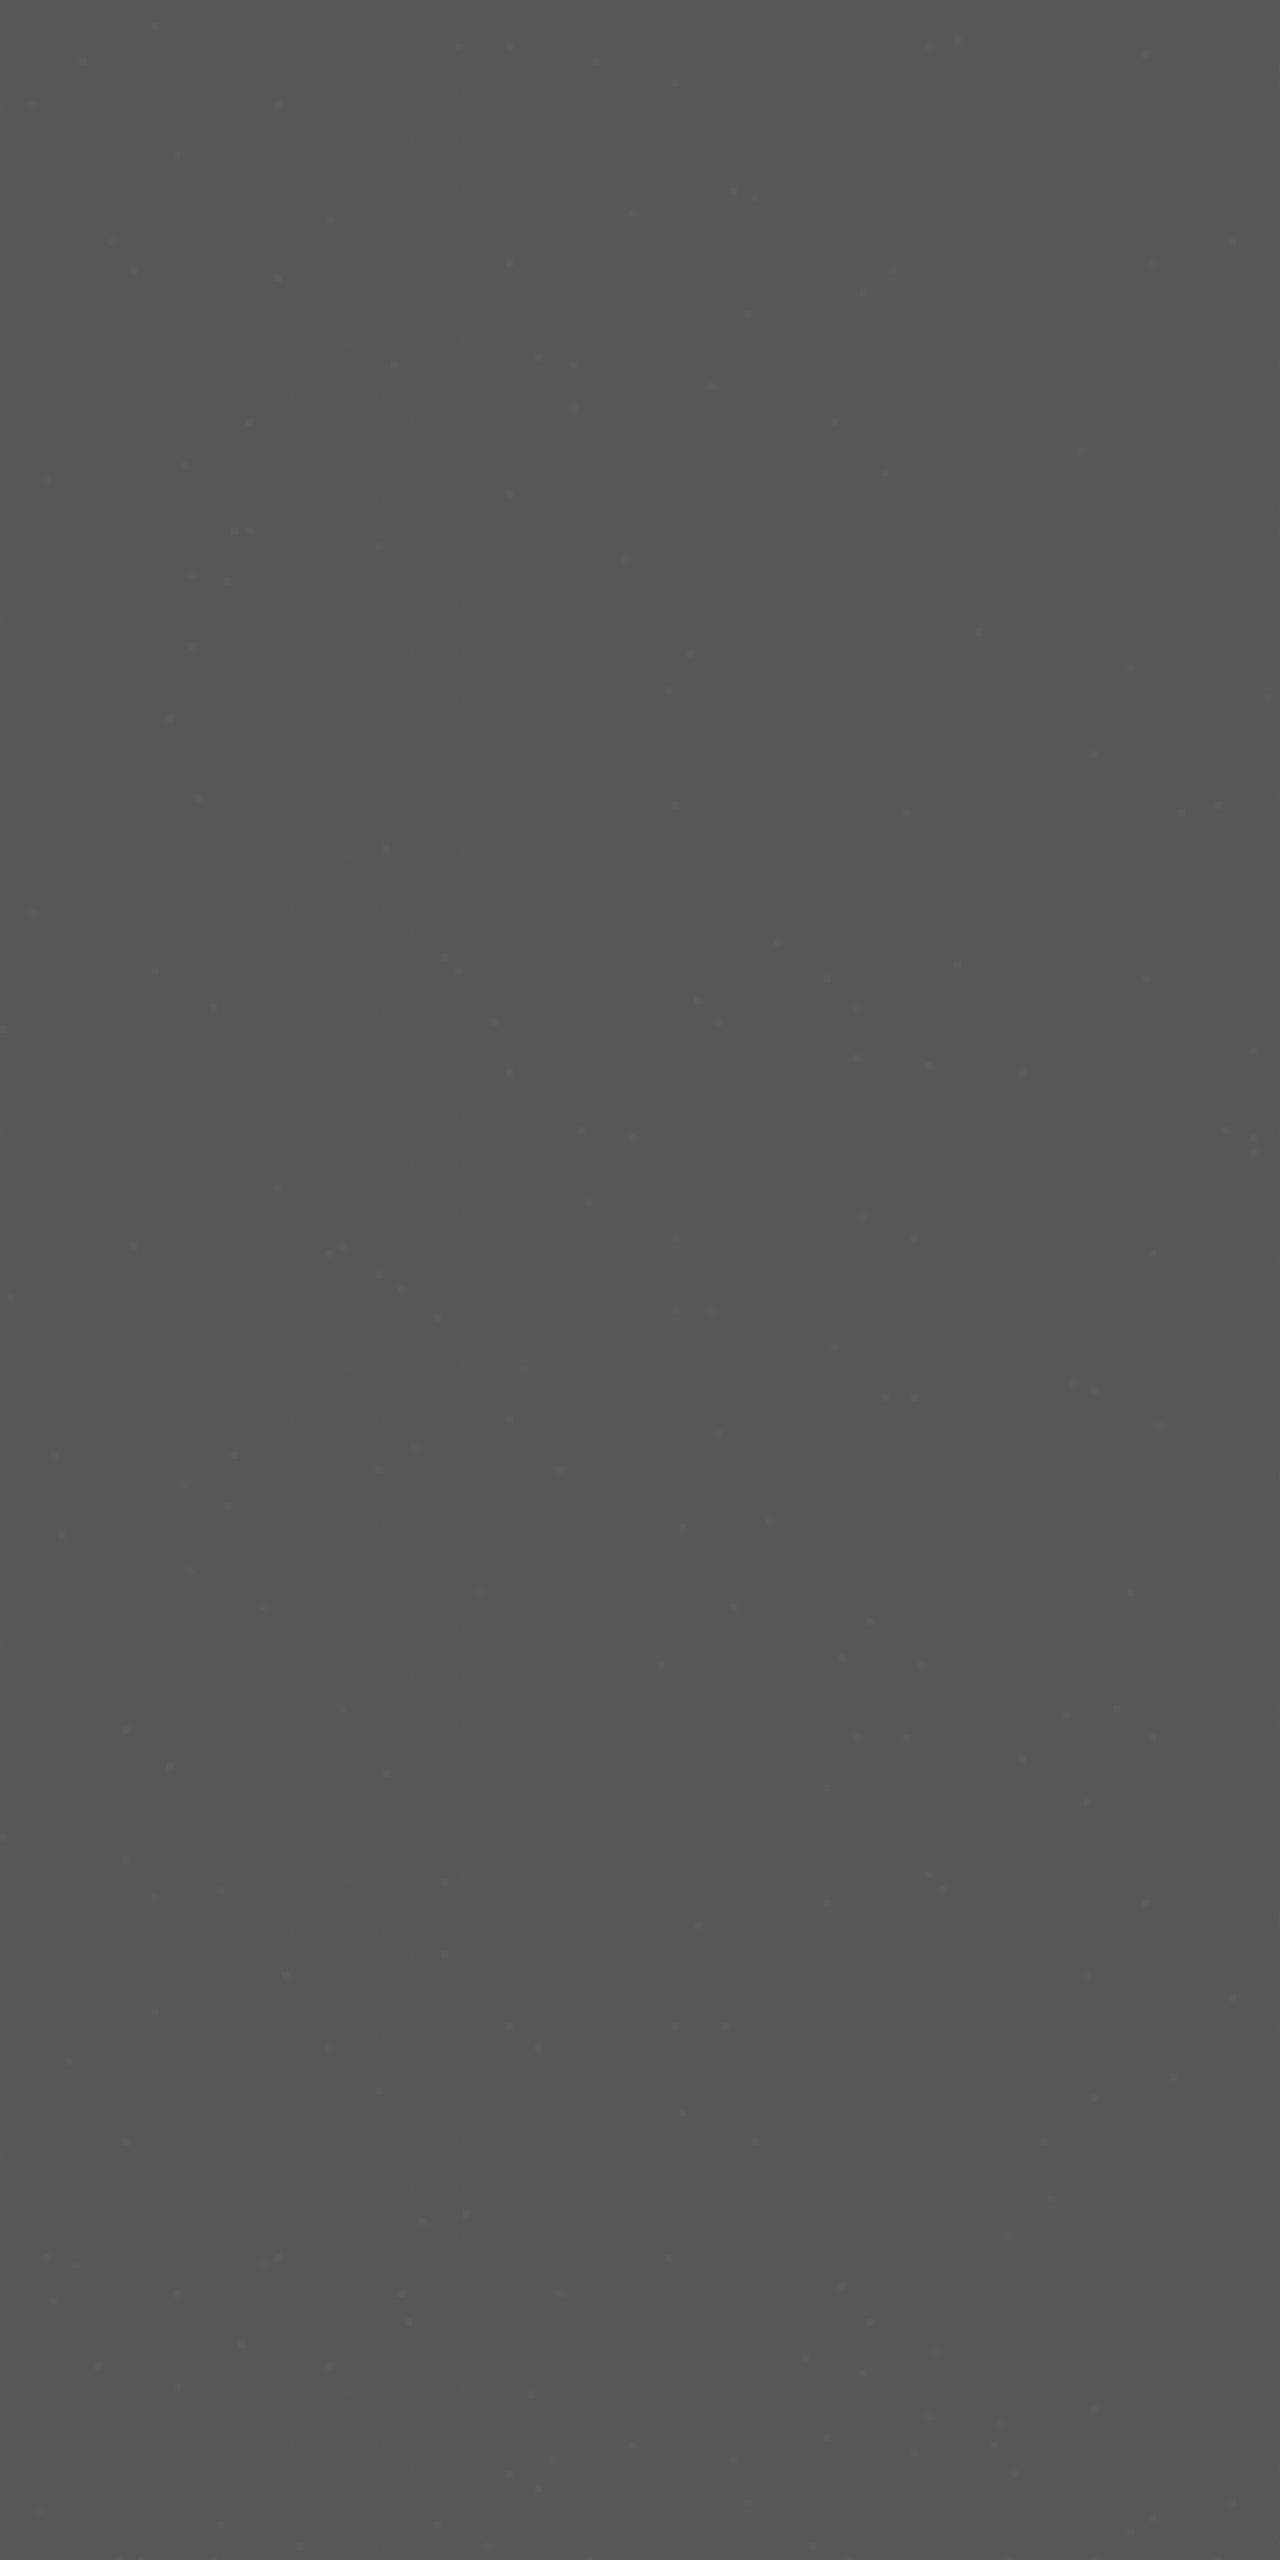 Crayons of Cerim Mist Matte 6mm 120 x 240